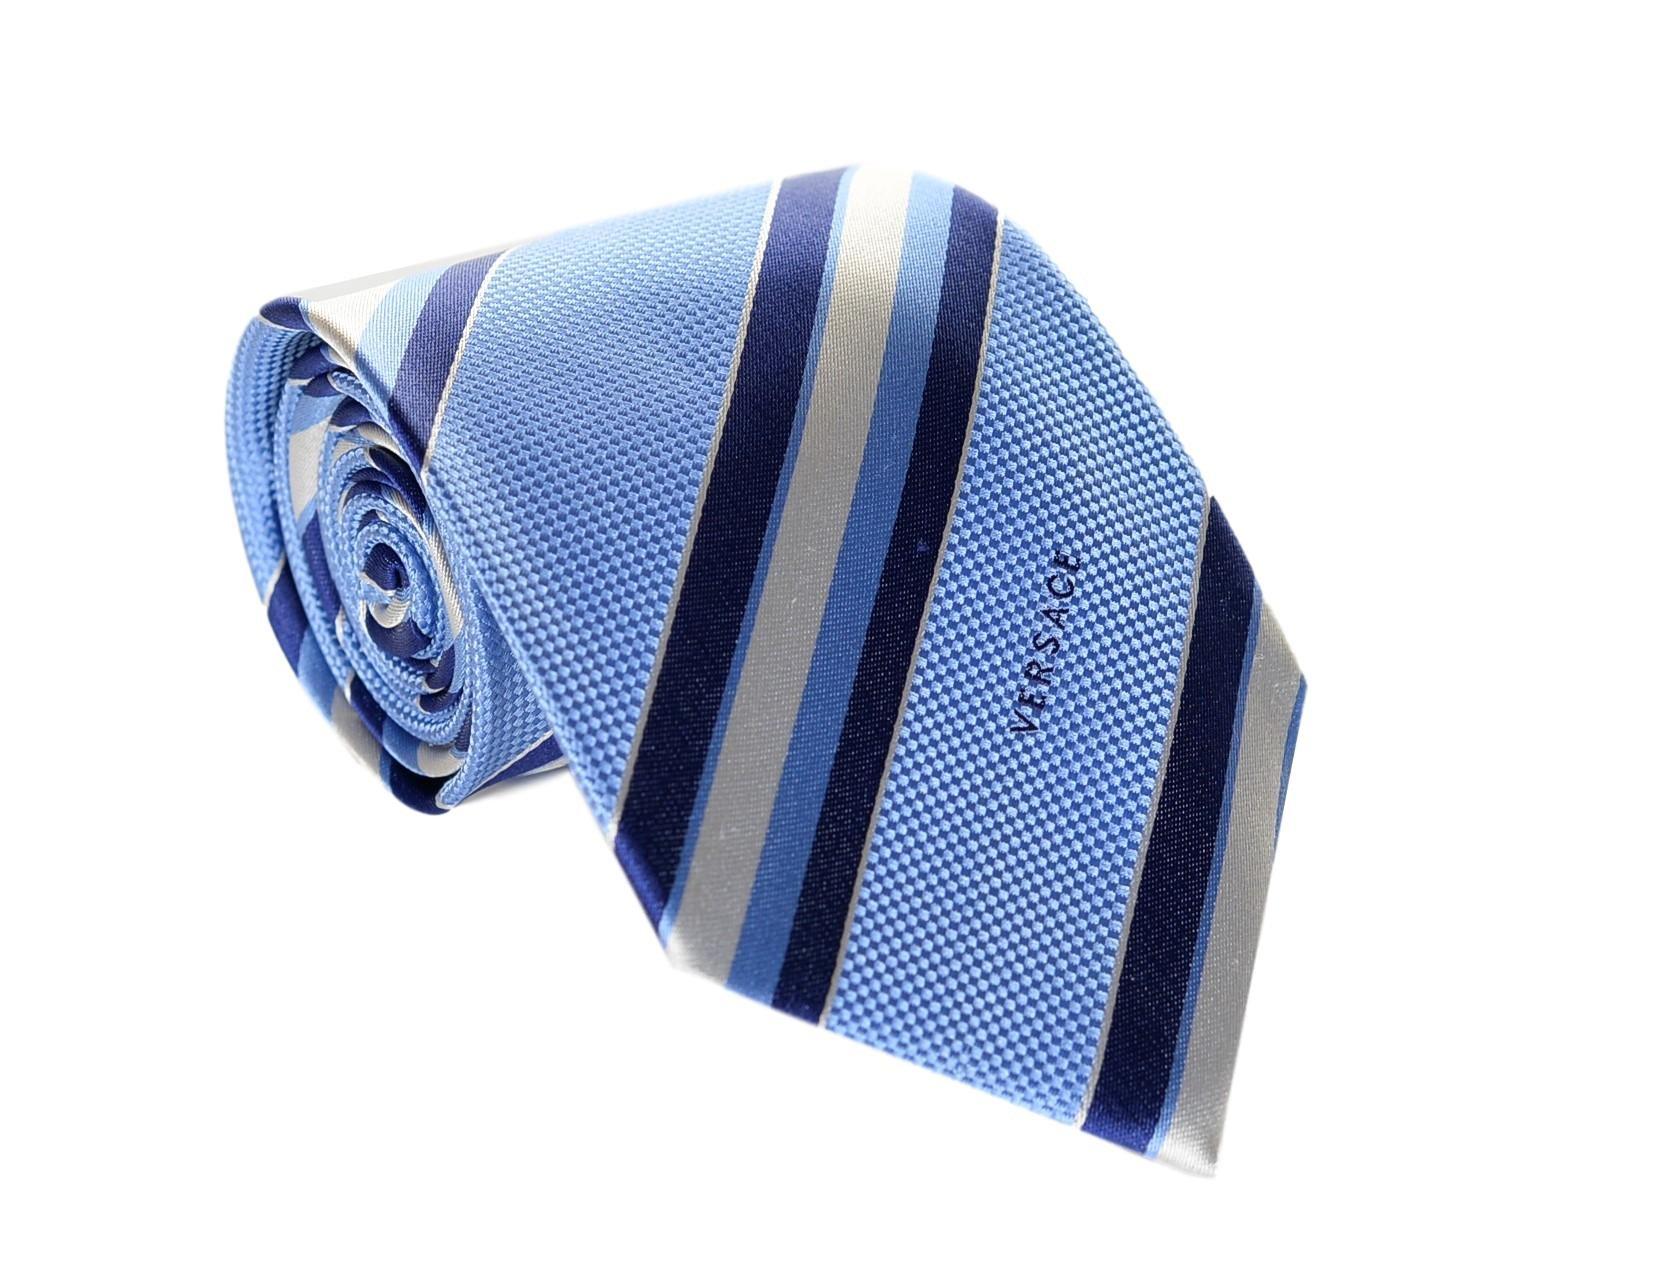 Versace Men's Multi Striped Woven Silk Necktie Lt. Blue-Navy